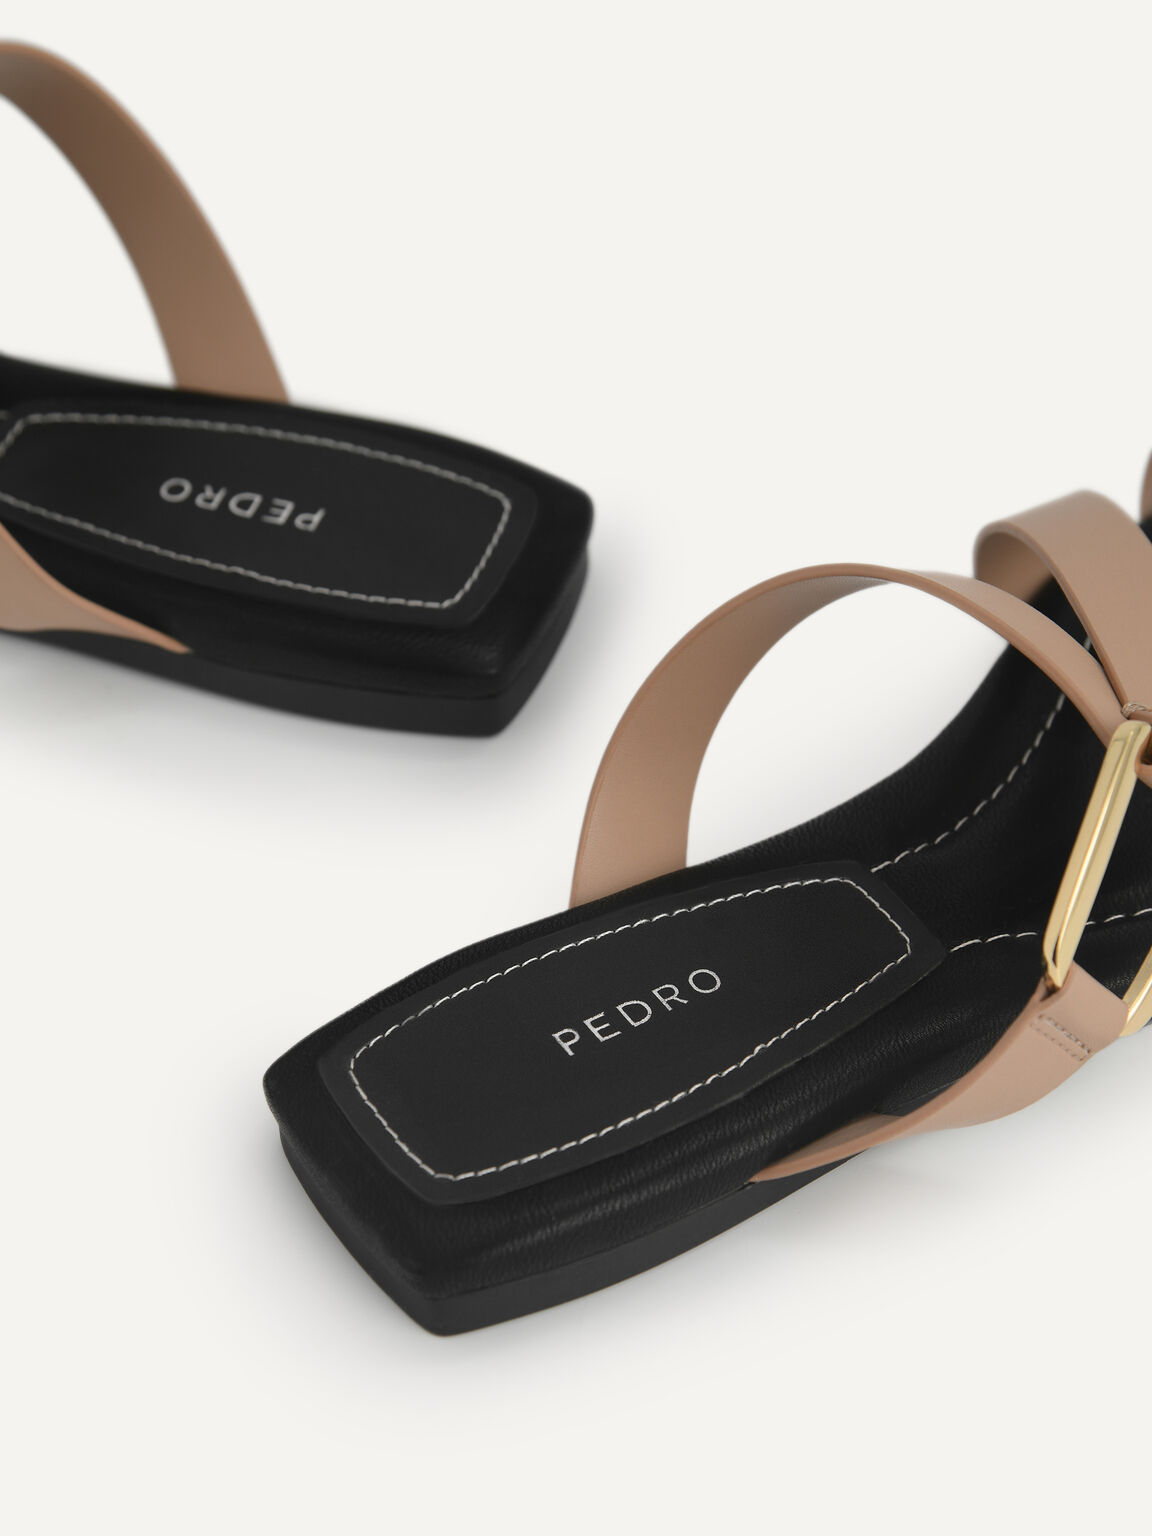 Square-Toe Toe Loop Sandals, Taupe, hi-res